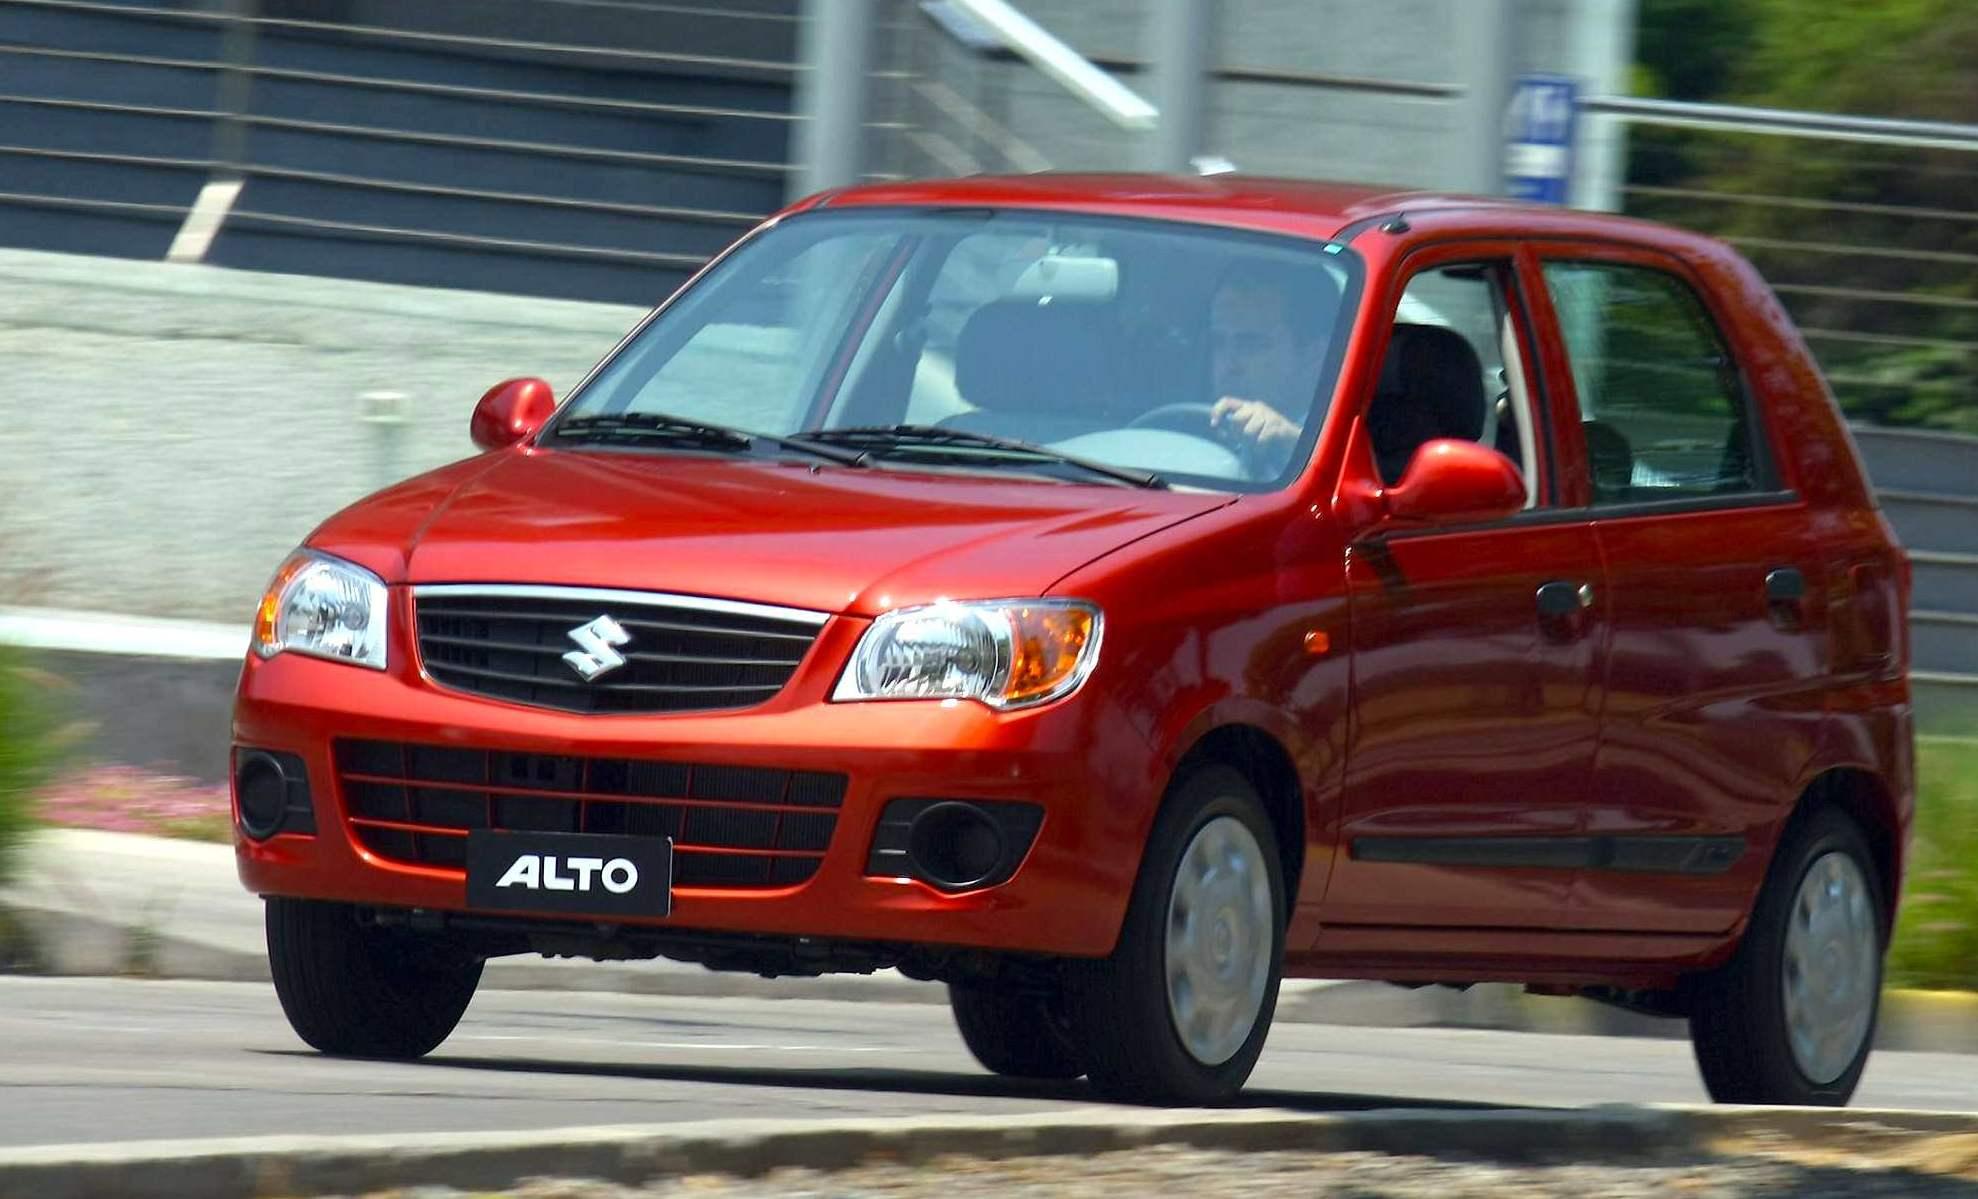 Maruti Suzuki Alto K10 – The Largest Selling Indian Car